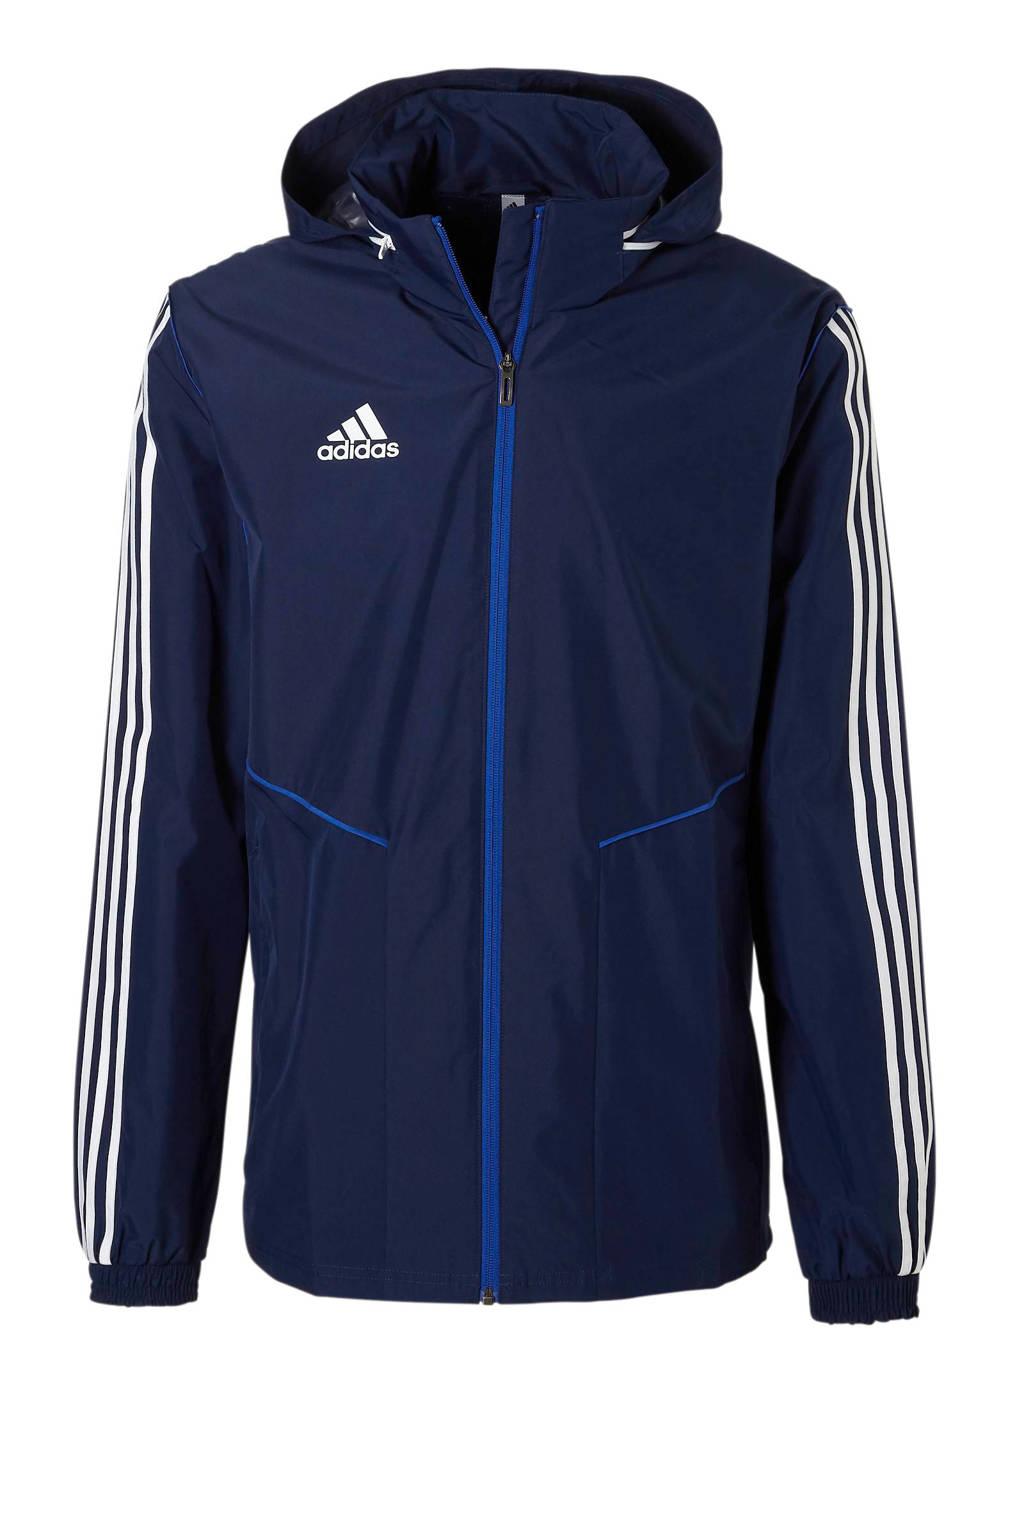 adidas performance   sportjack donkerblauw, Donkerblauw/wit